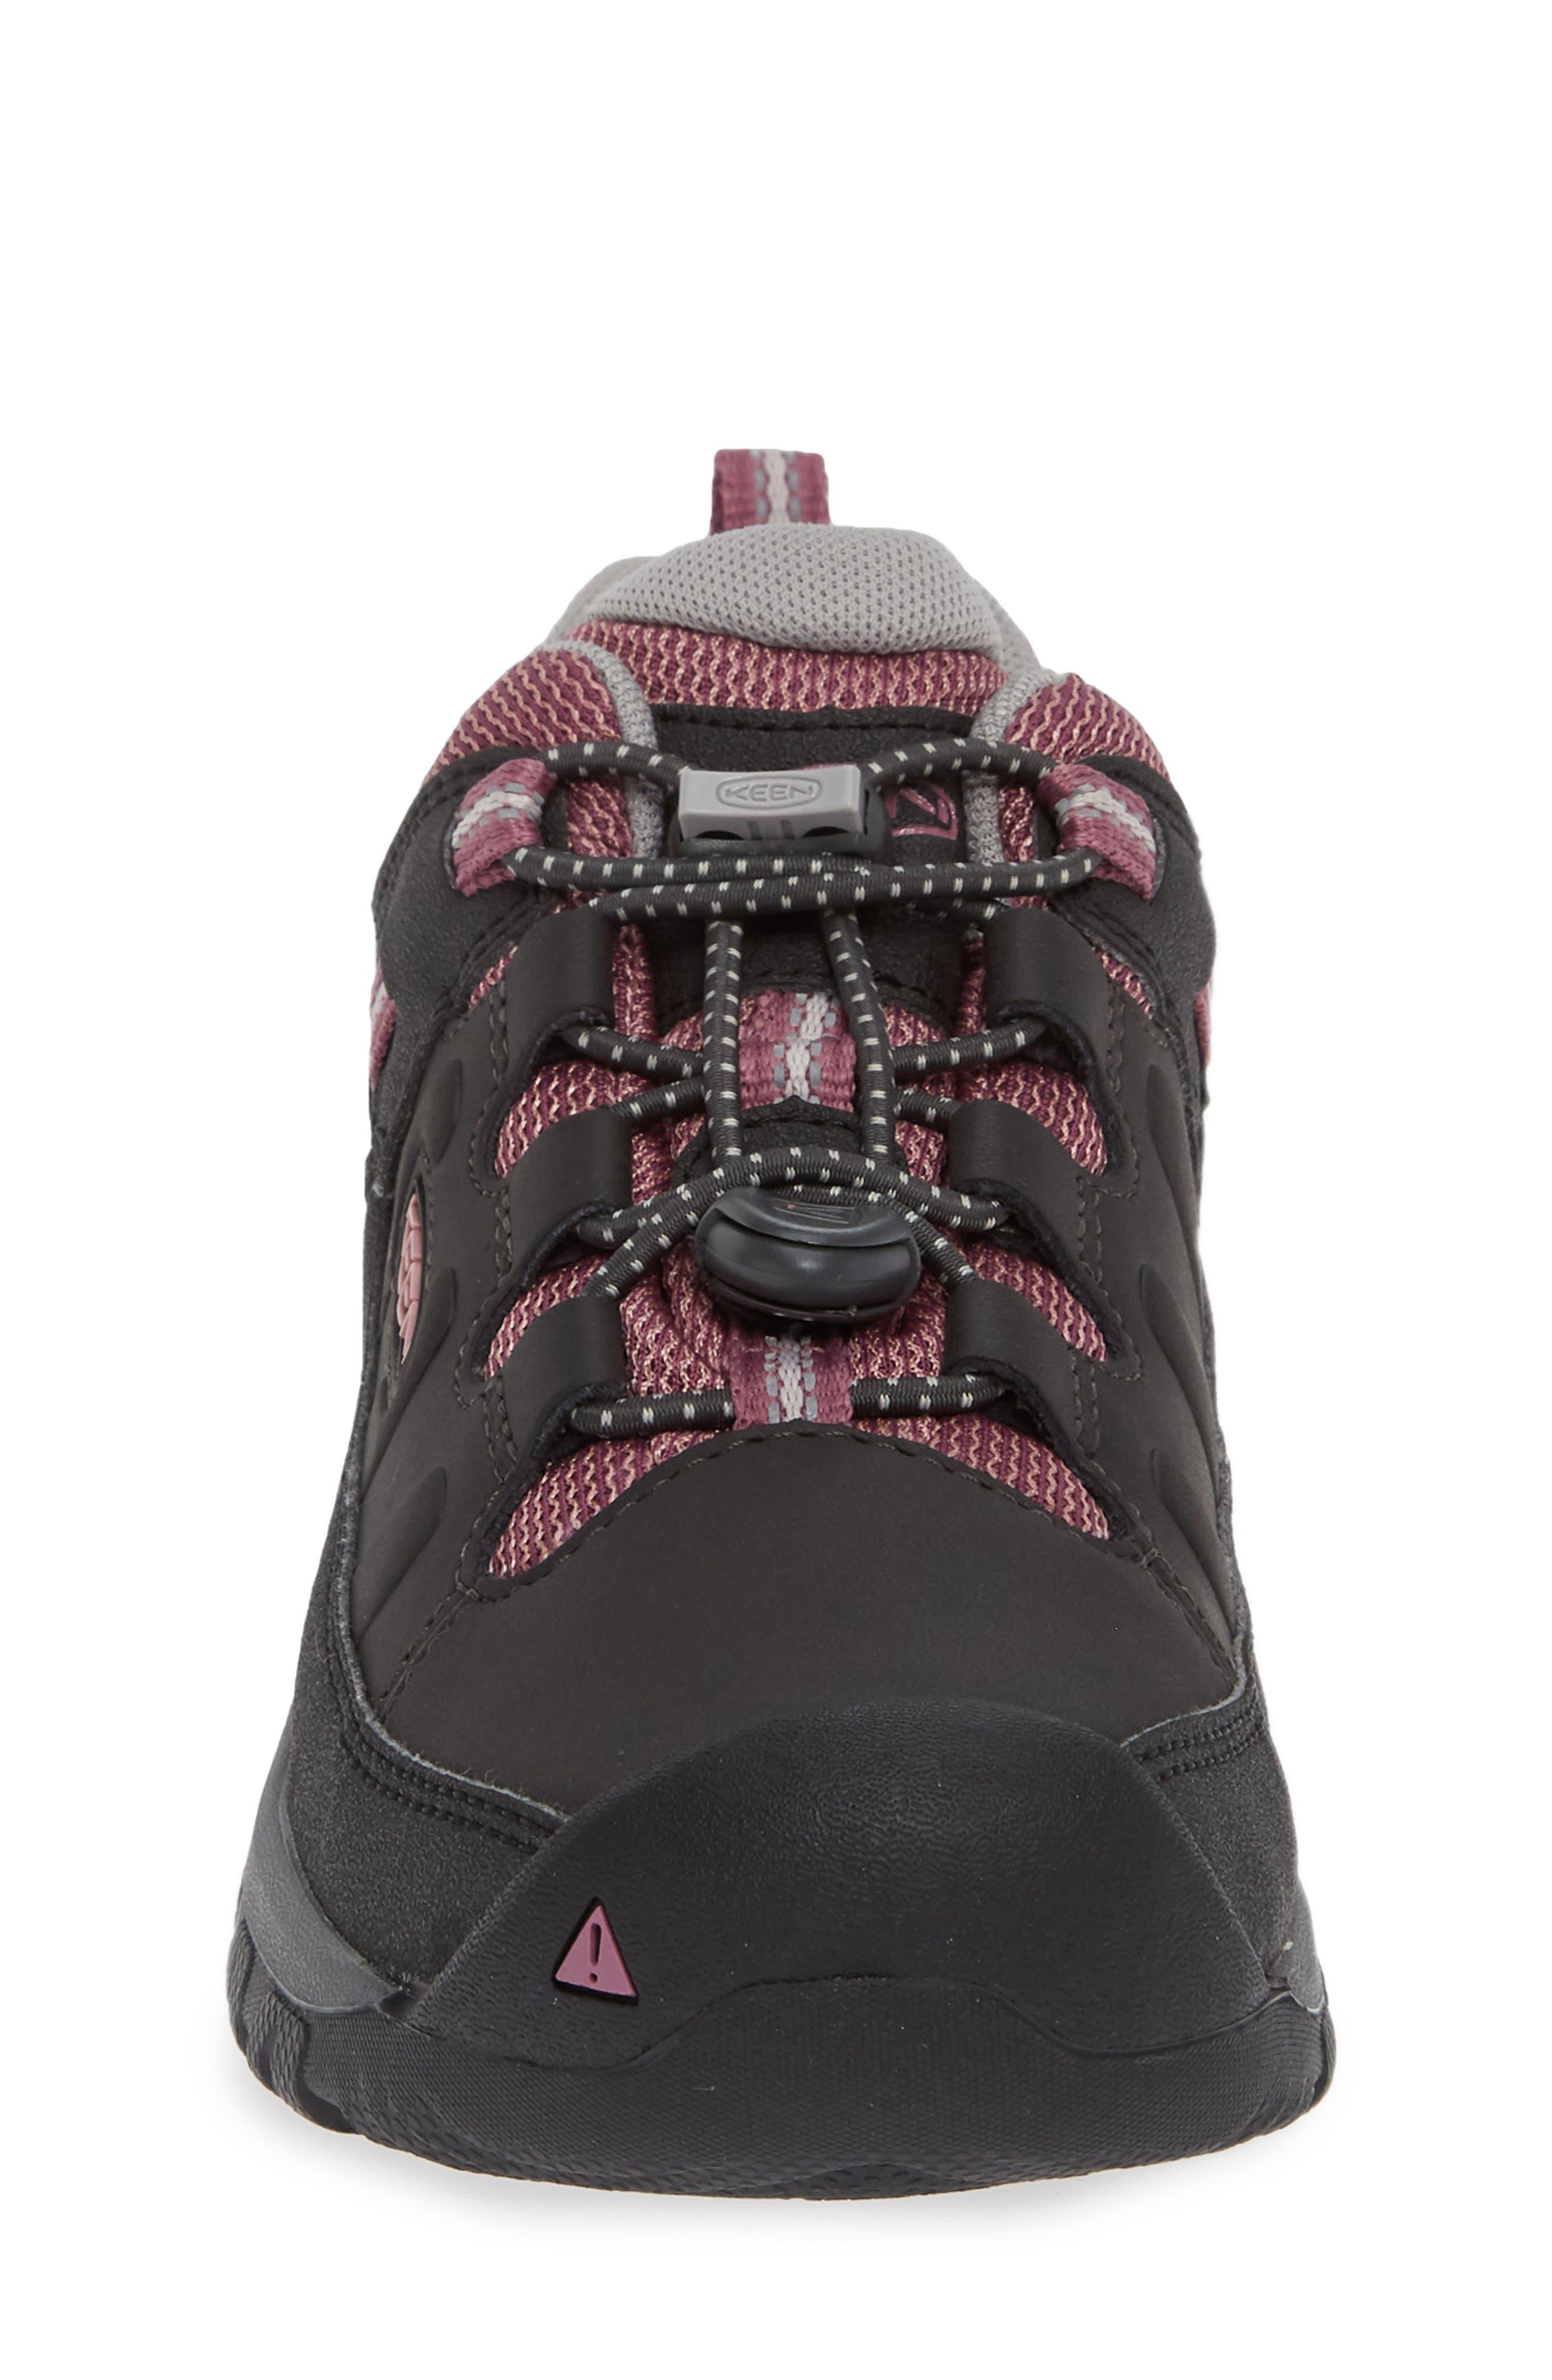 Targhee Low Waterproof Boots,                             Alternate thumbnail 4, color,                             RAVEN/ TULIPWOOD/ TULIPWOOD